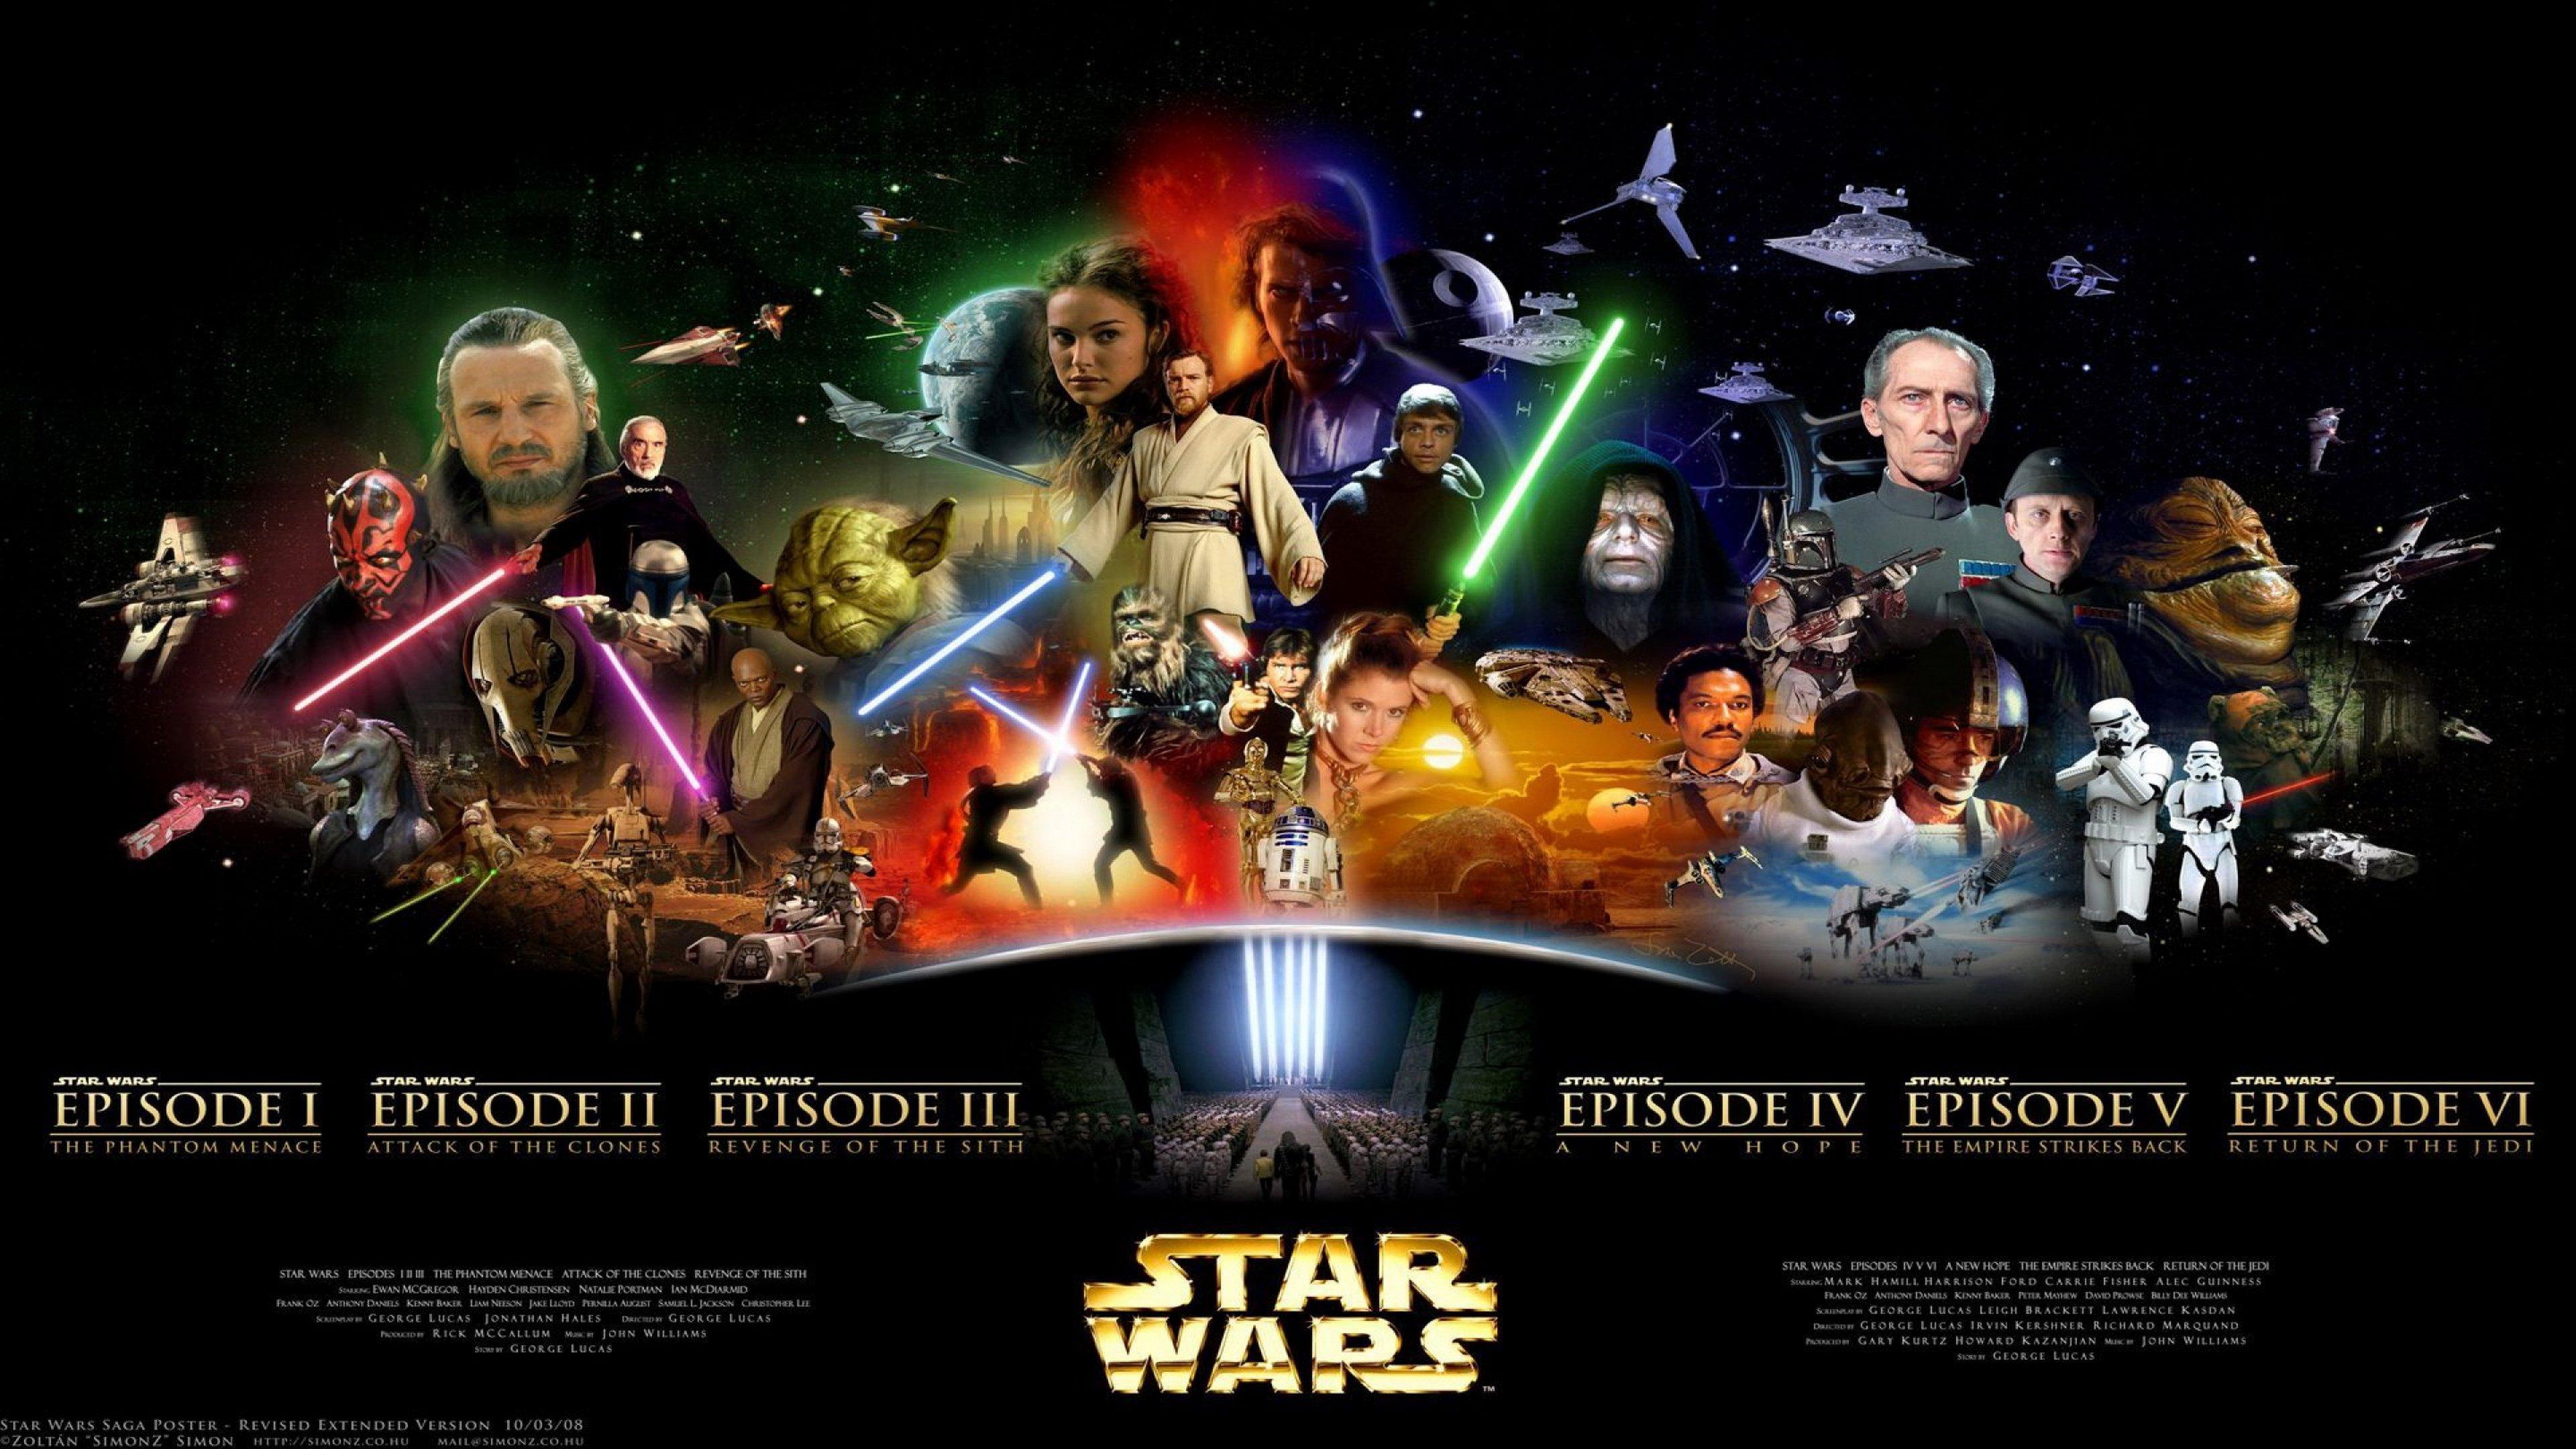 45 4k Wallpaper Star Wars On Wallpapersafari